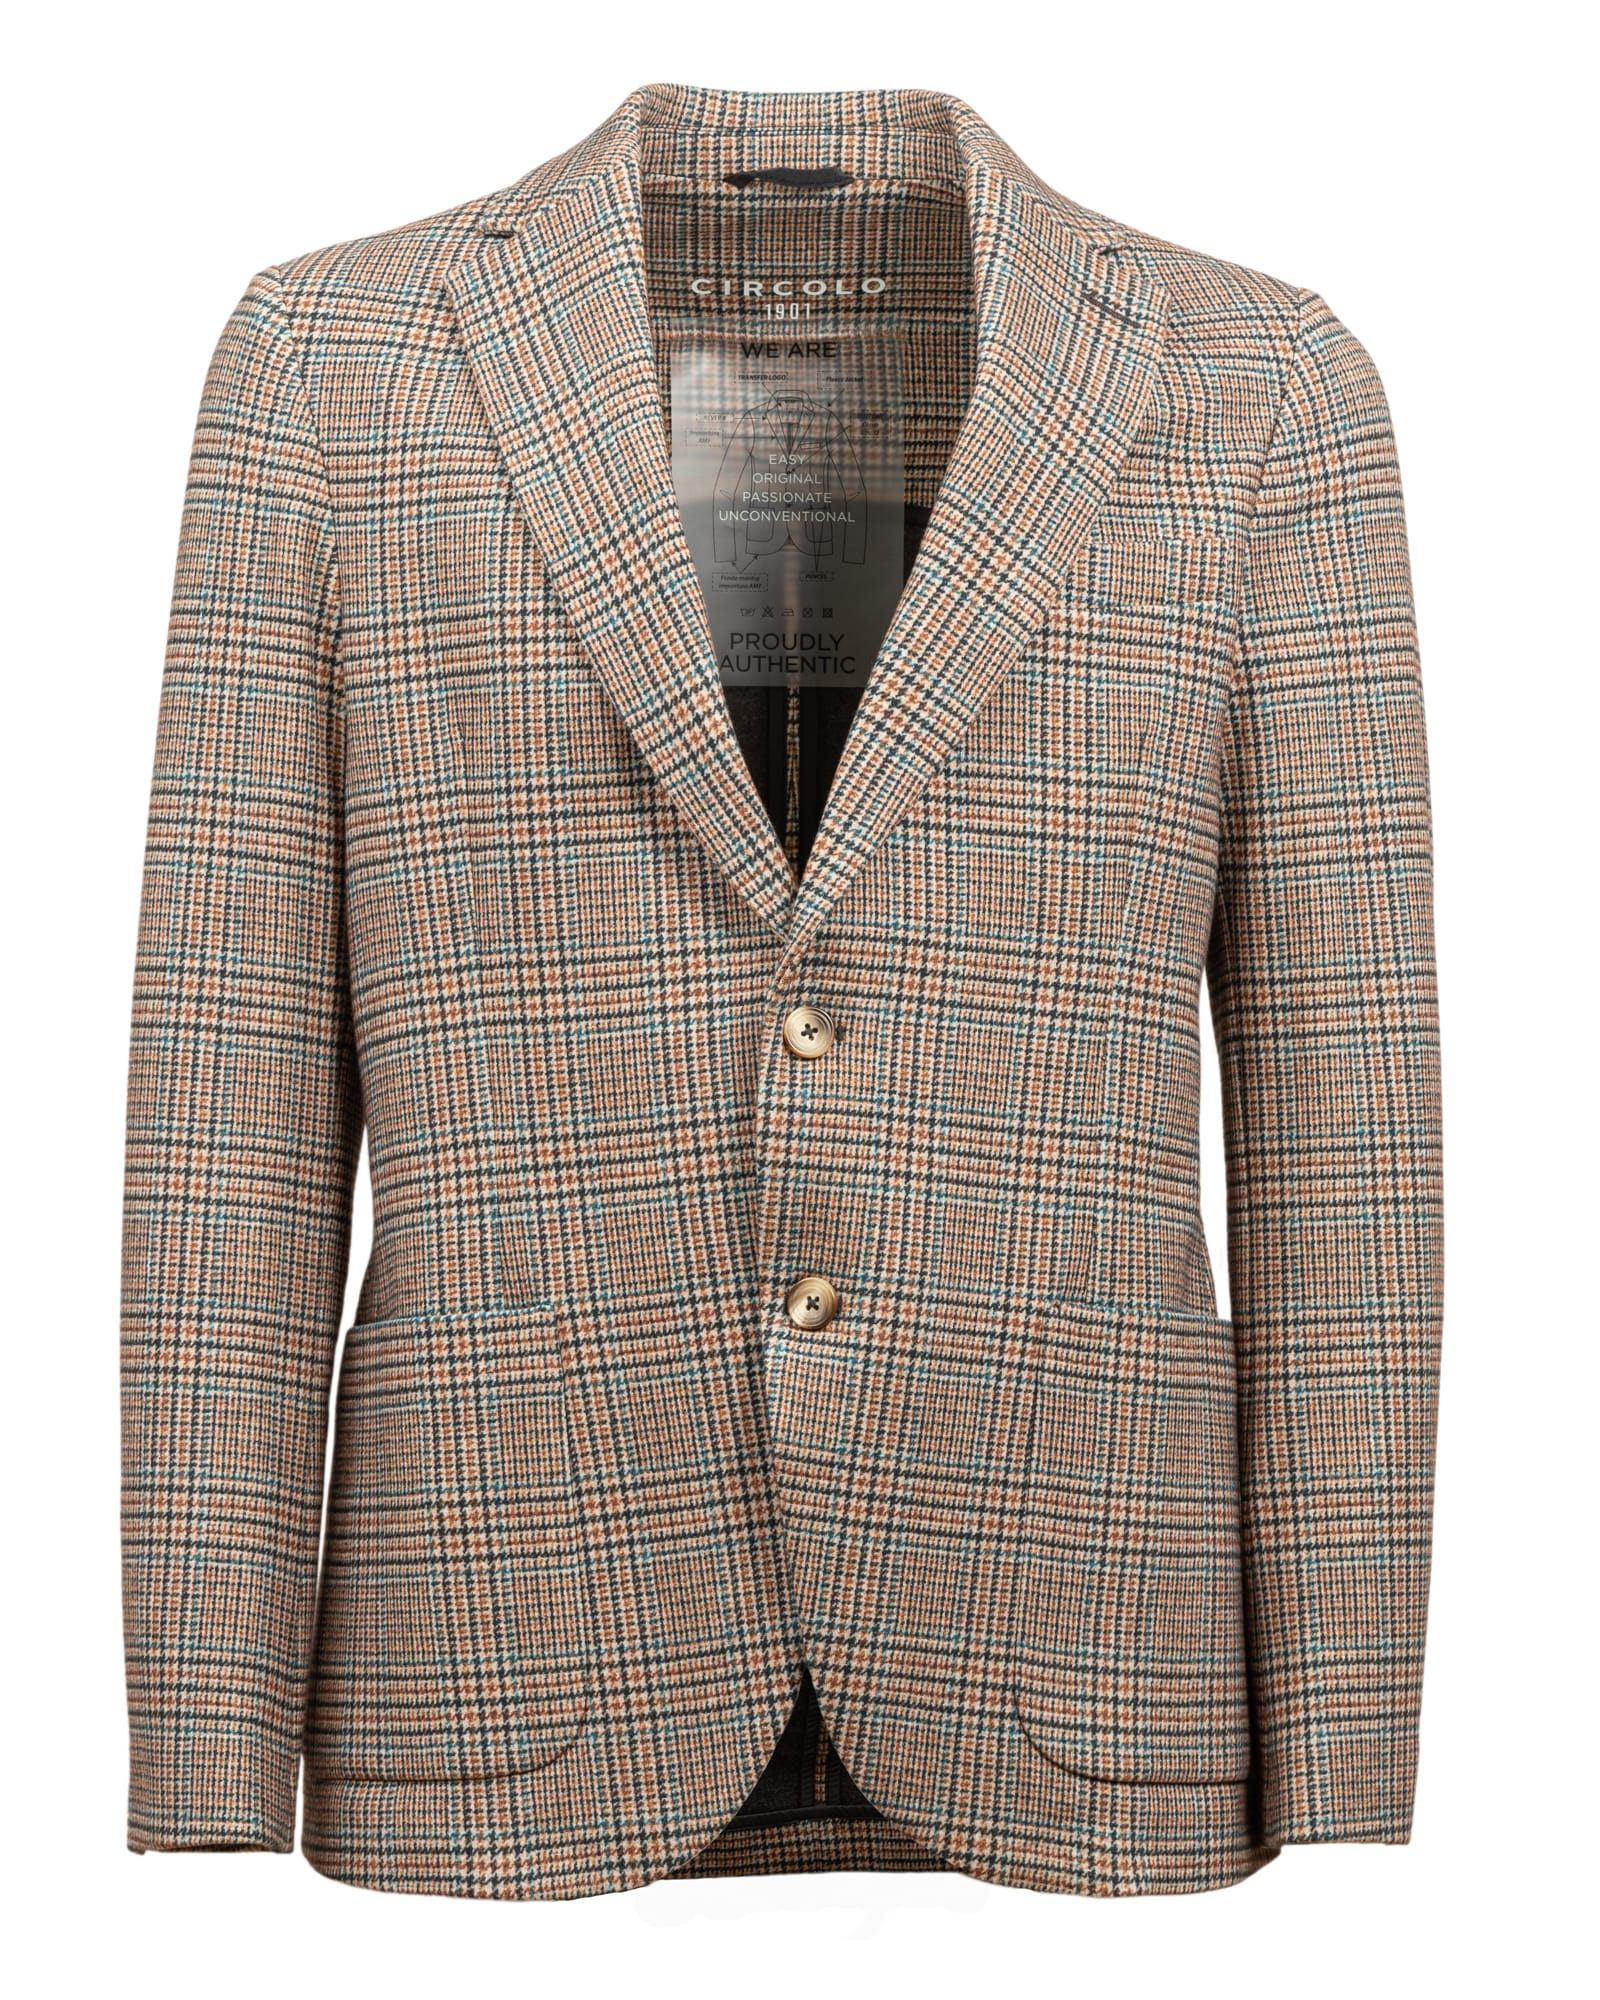 1901 prince of Wales jacket